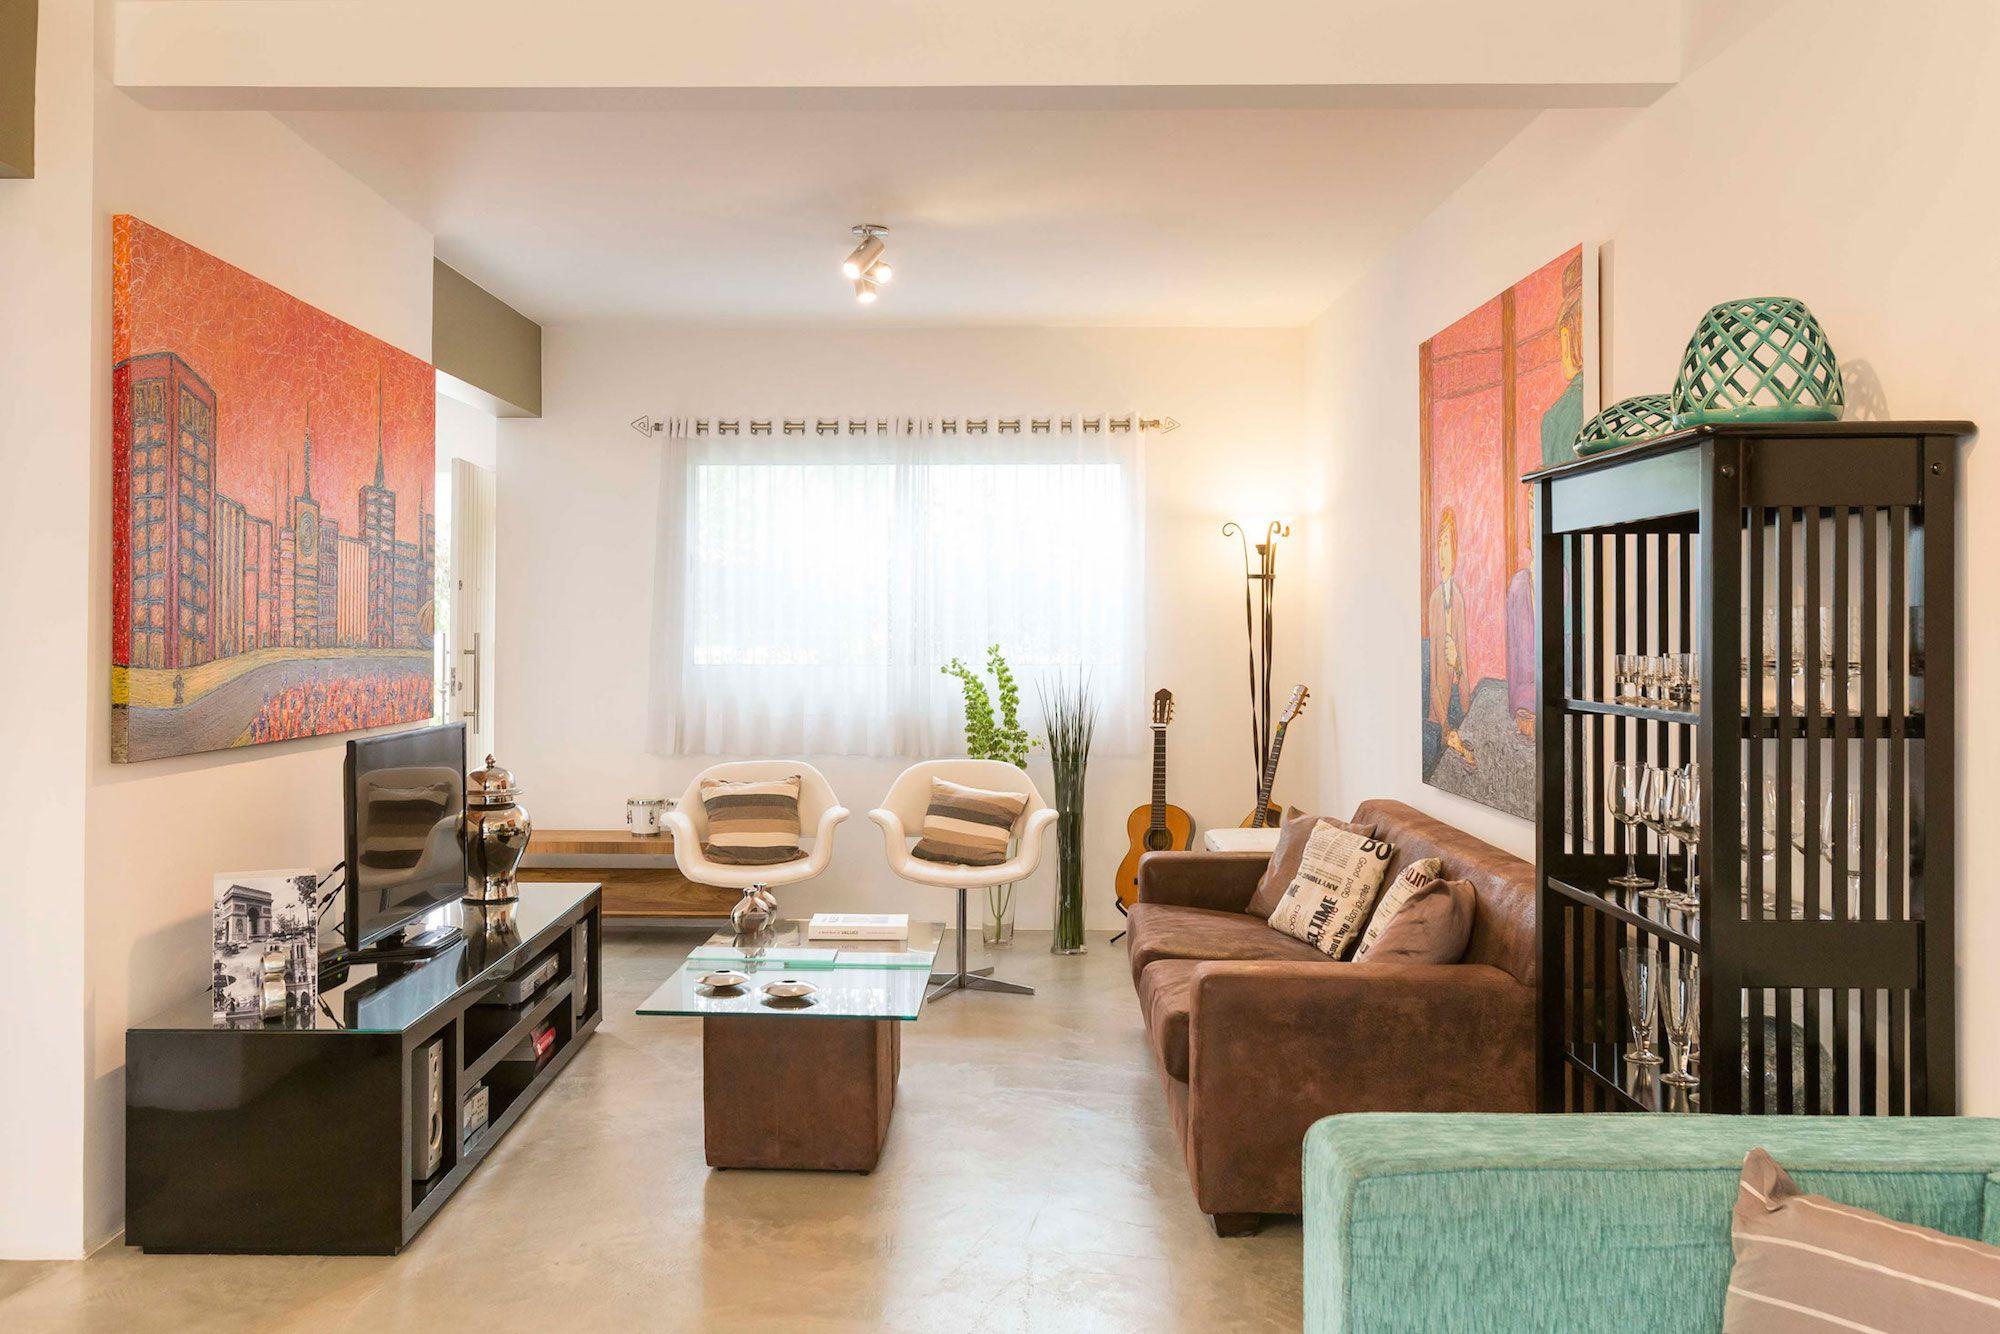 Granja-Julieta-Residence-12